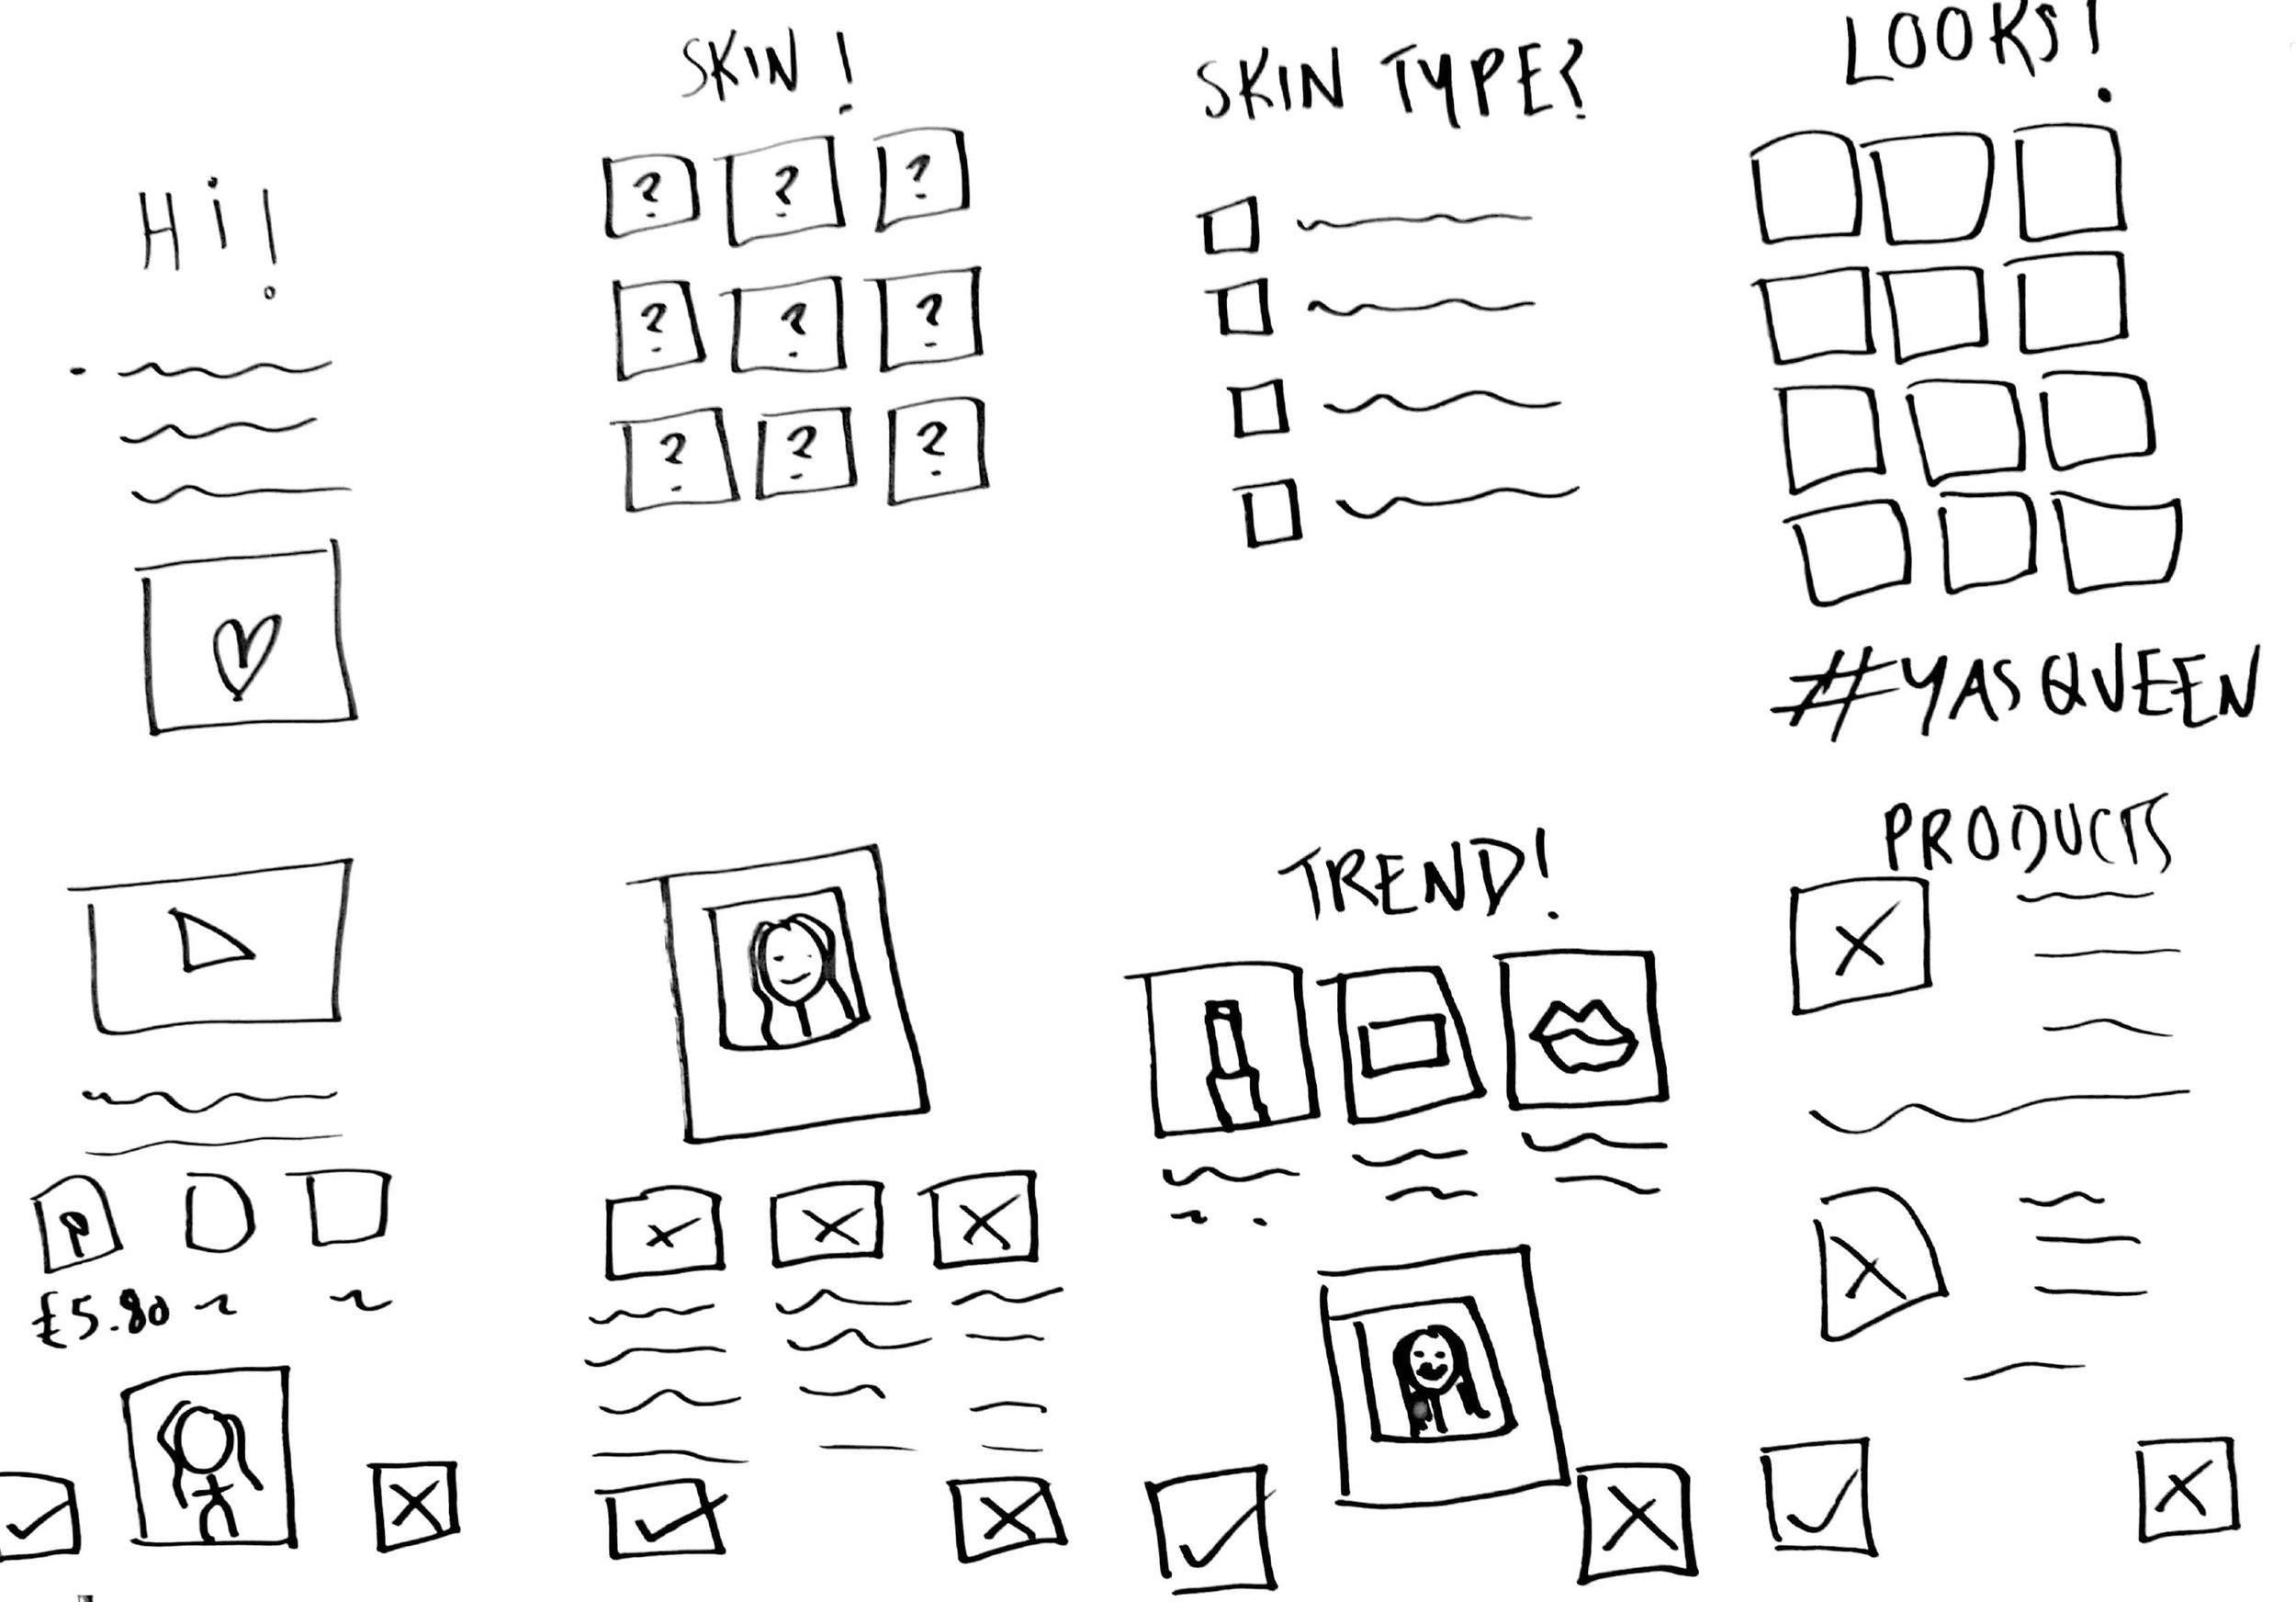 Sketches from Design Studio